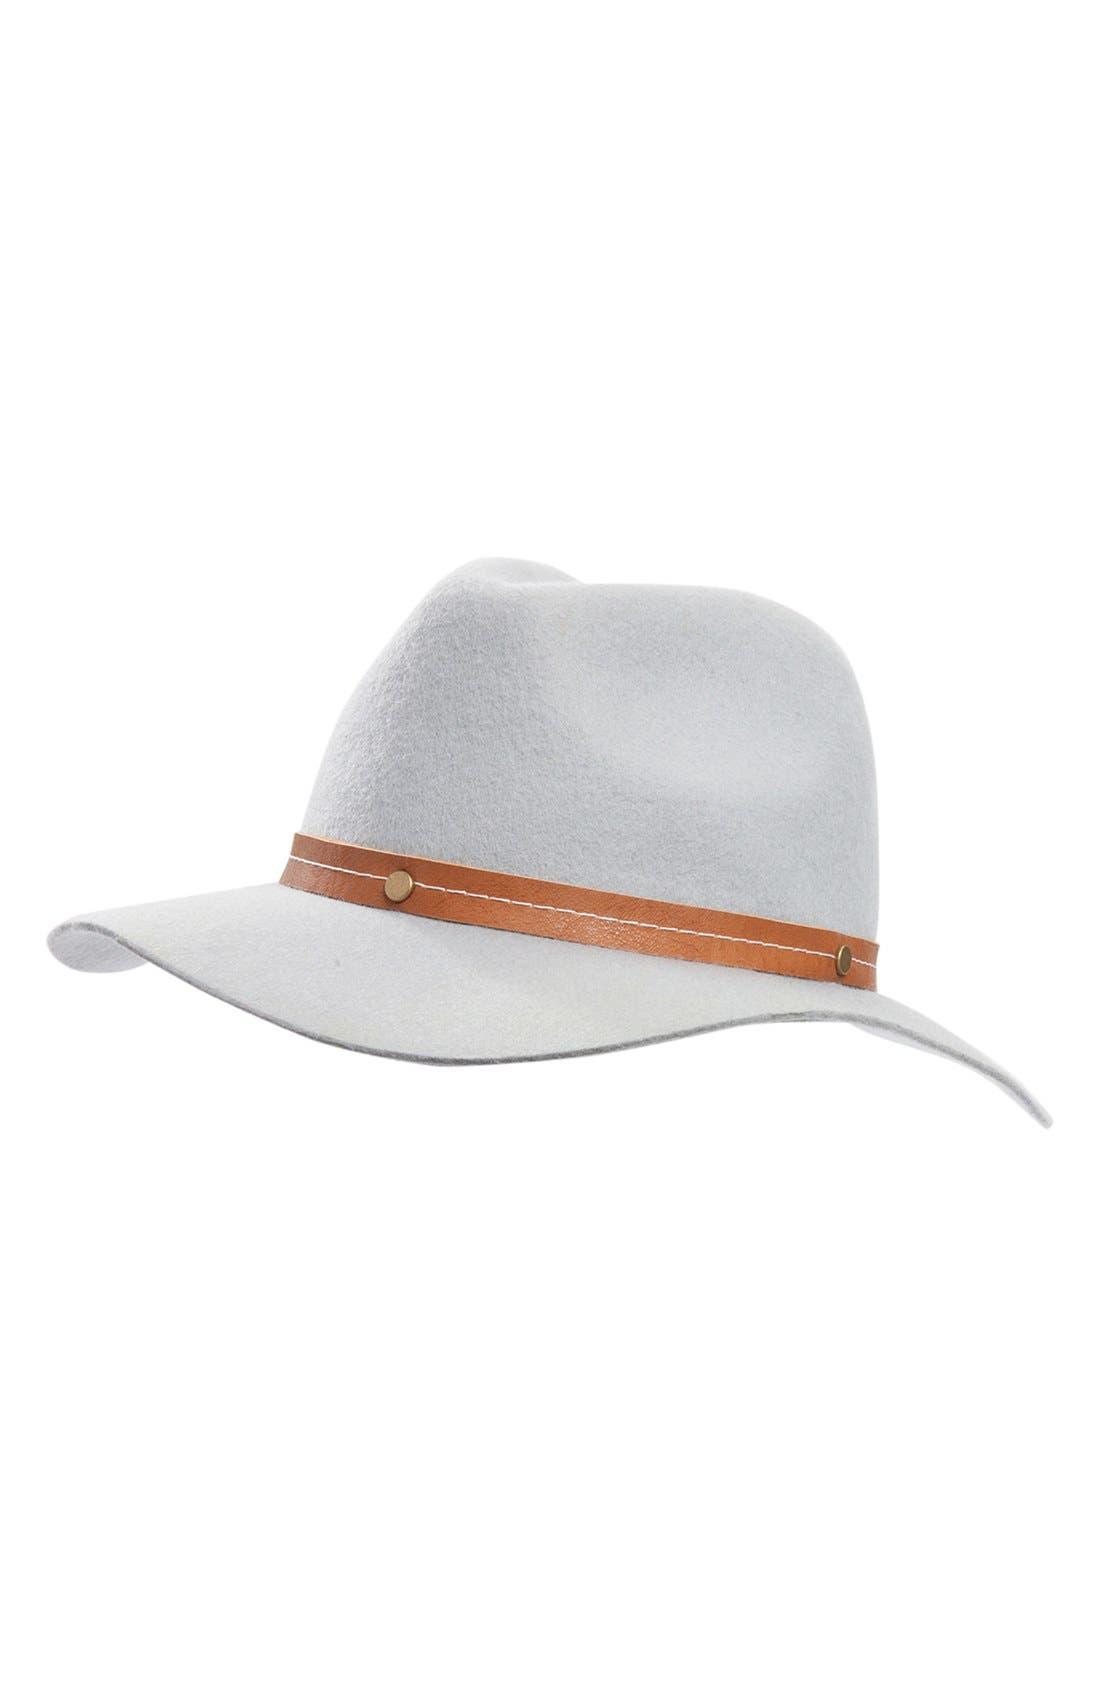 Alternate Image 3  - Billabong 'Moon Gaze' Wool Panama Hat